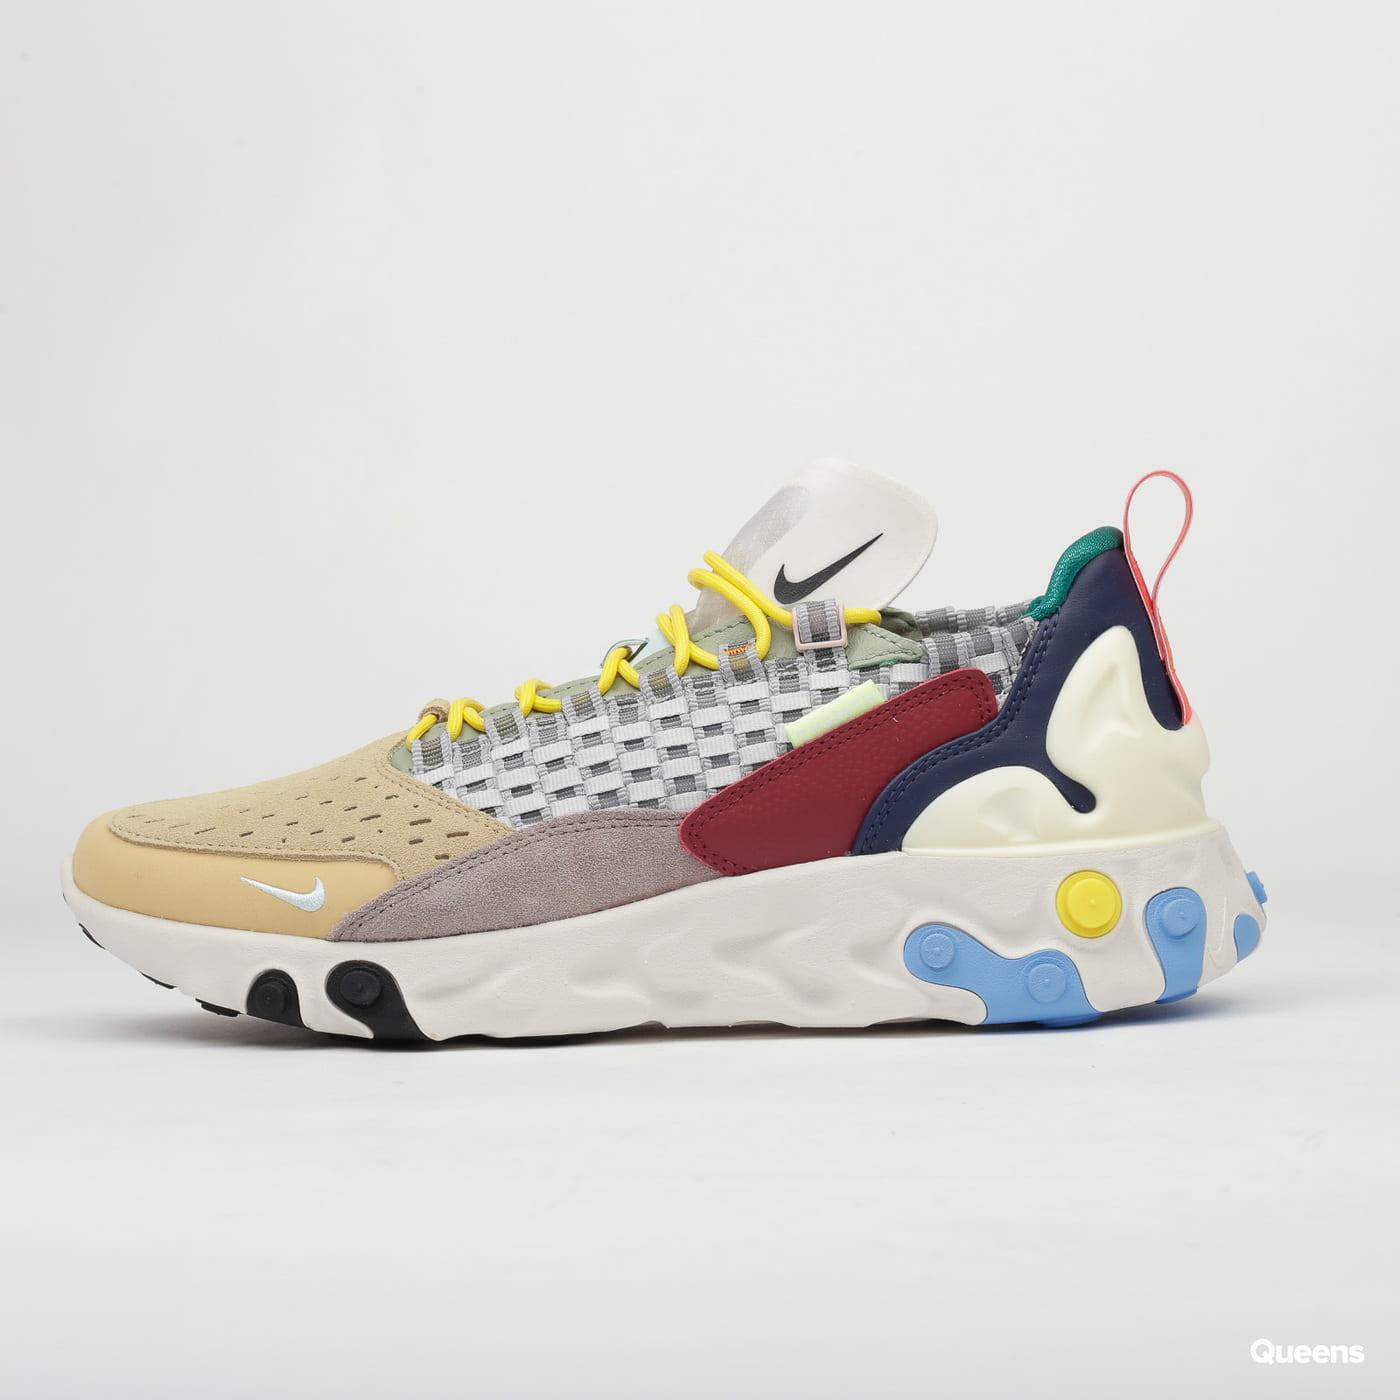 Nike Nike React Sertu wolf grey / teal tint - pumice